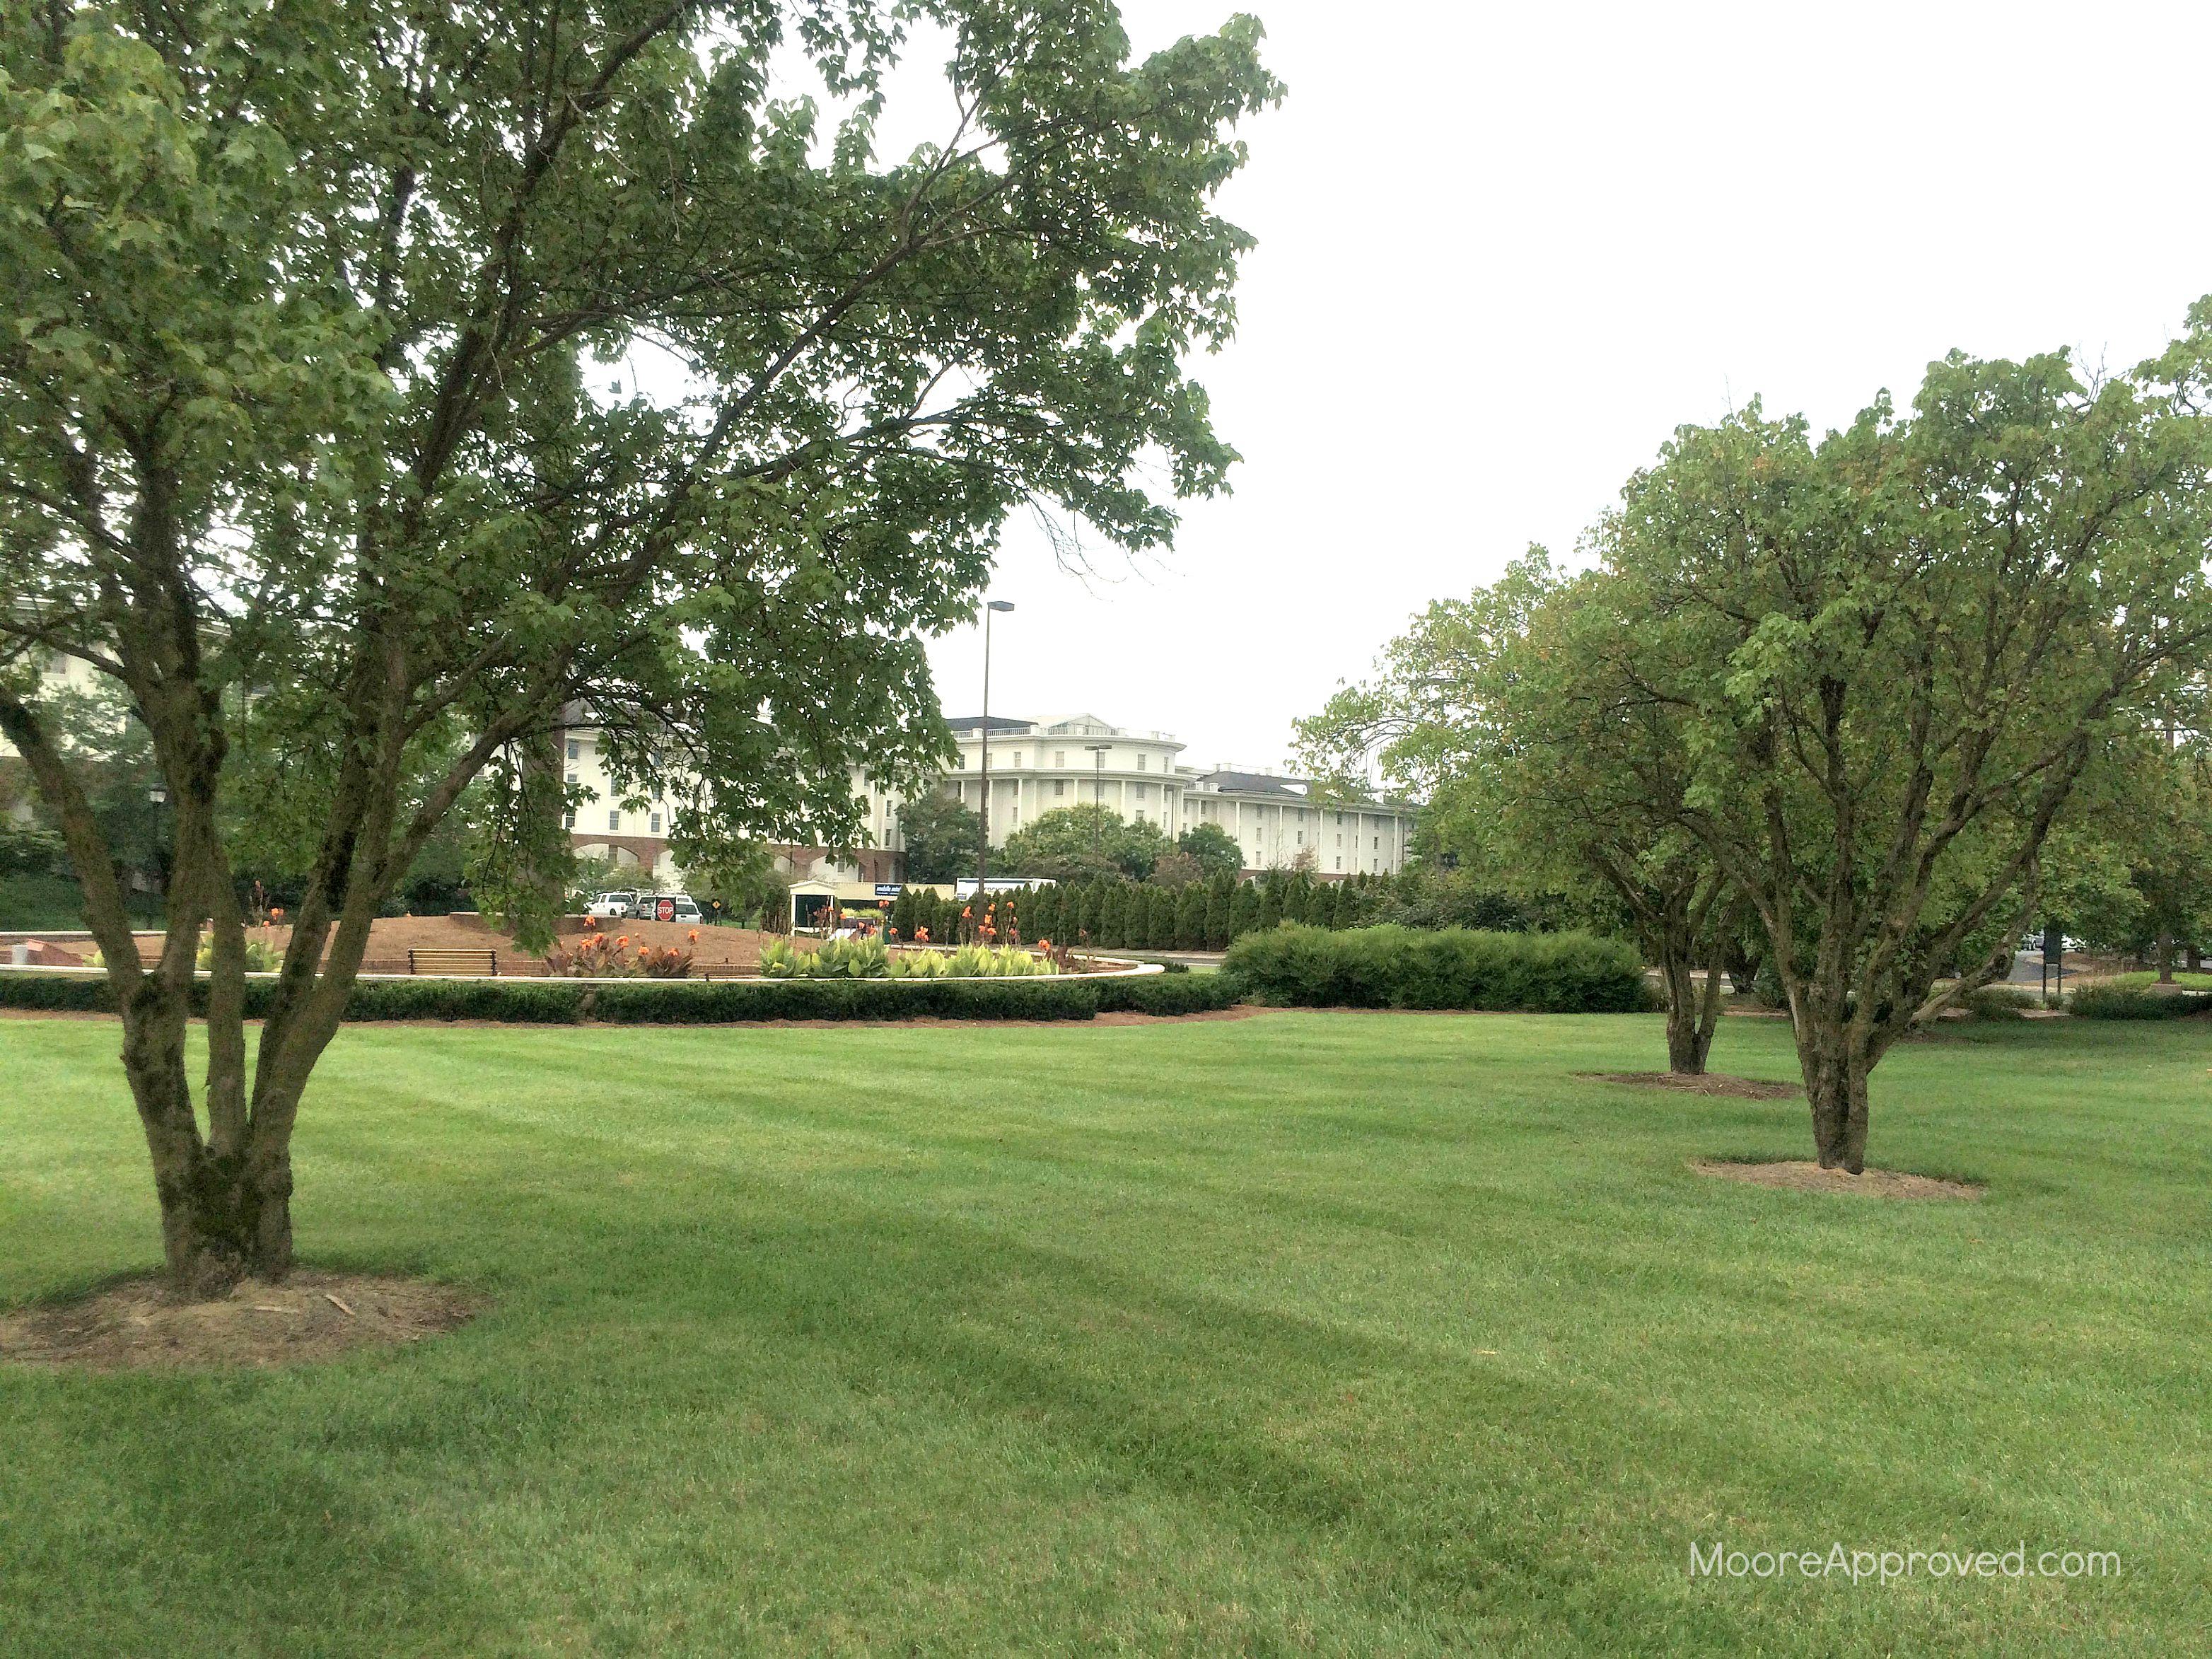 Nashville Road Trip – Gaylord Opryland Resort & Convention Center